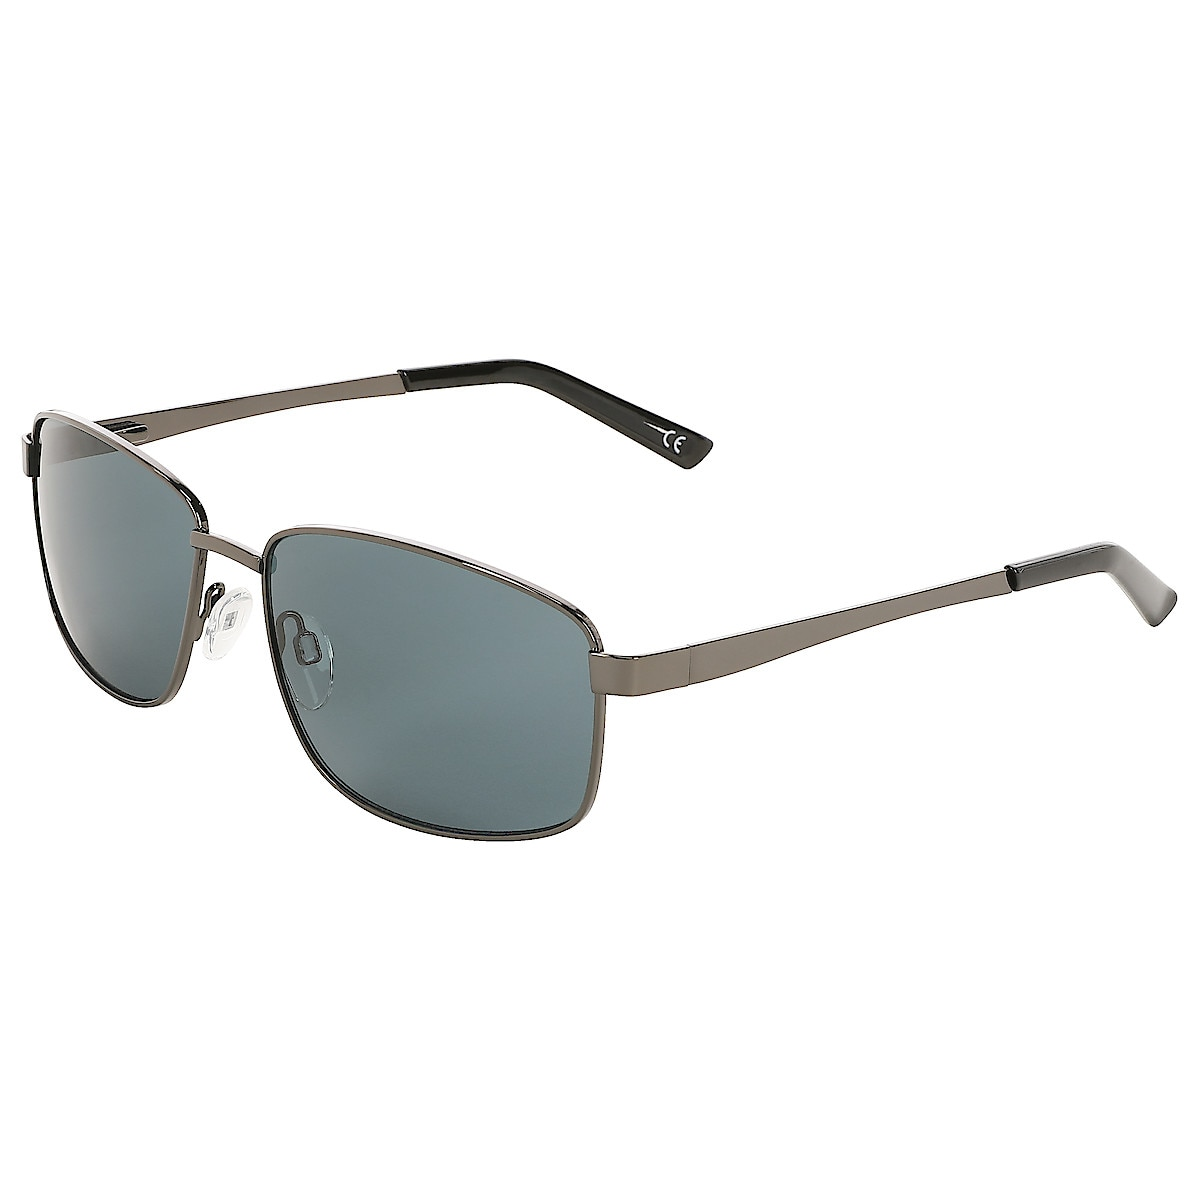 Solglasögon metall, svart